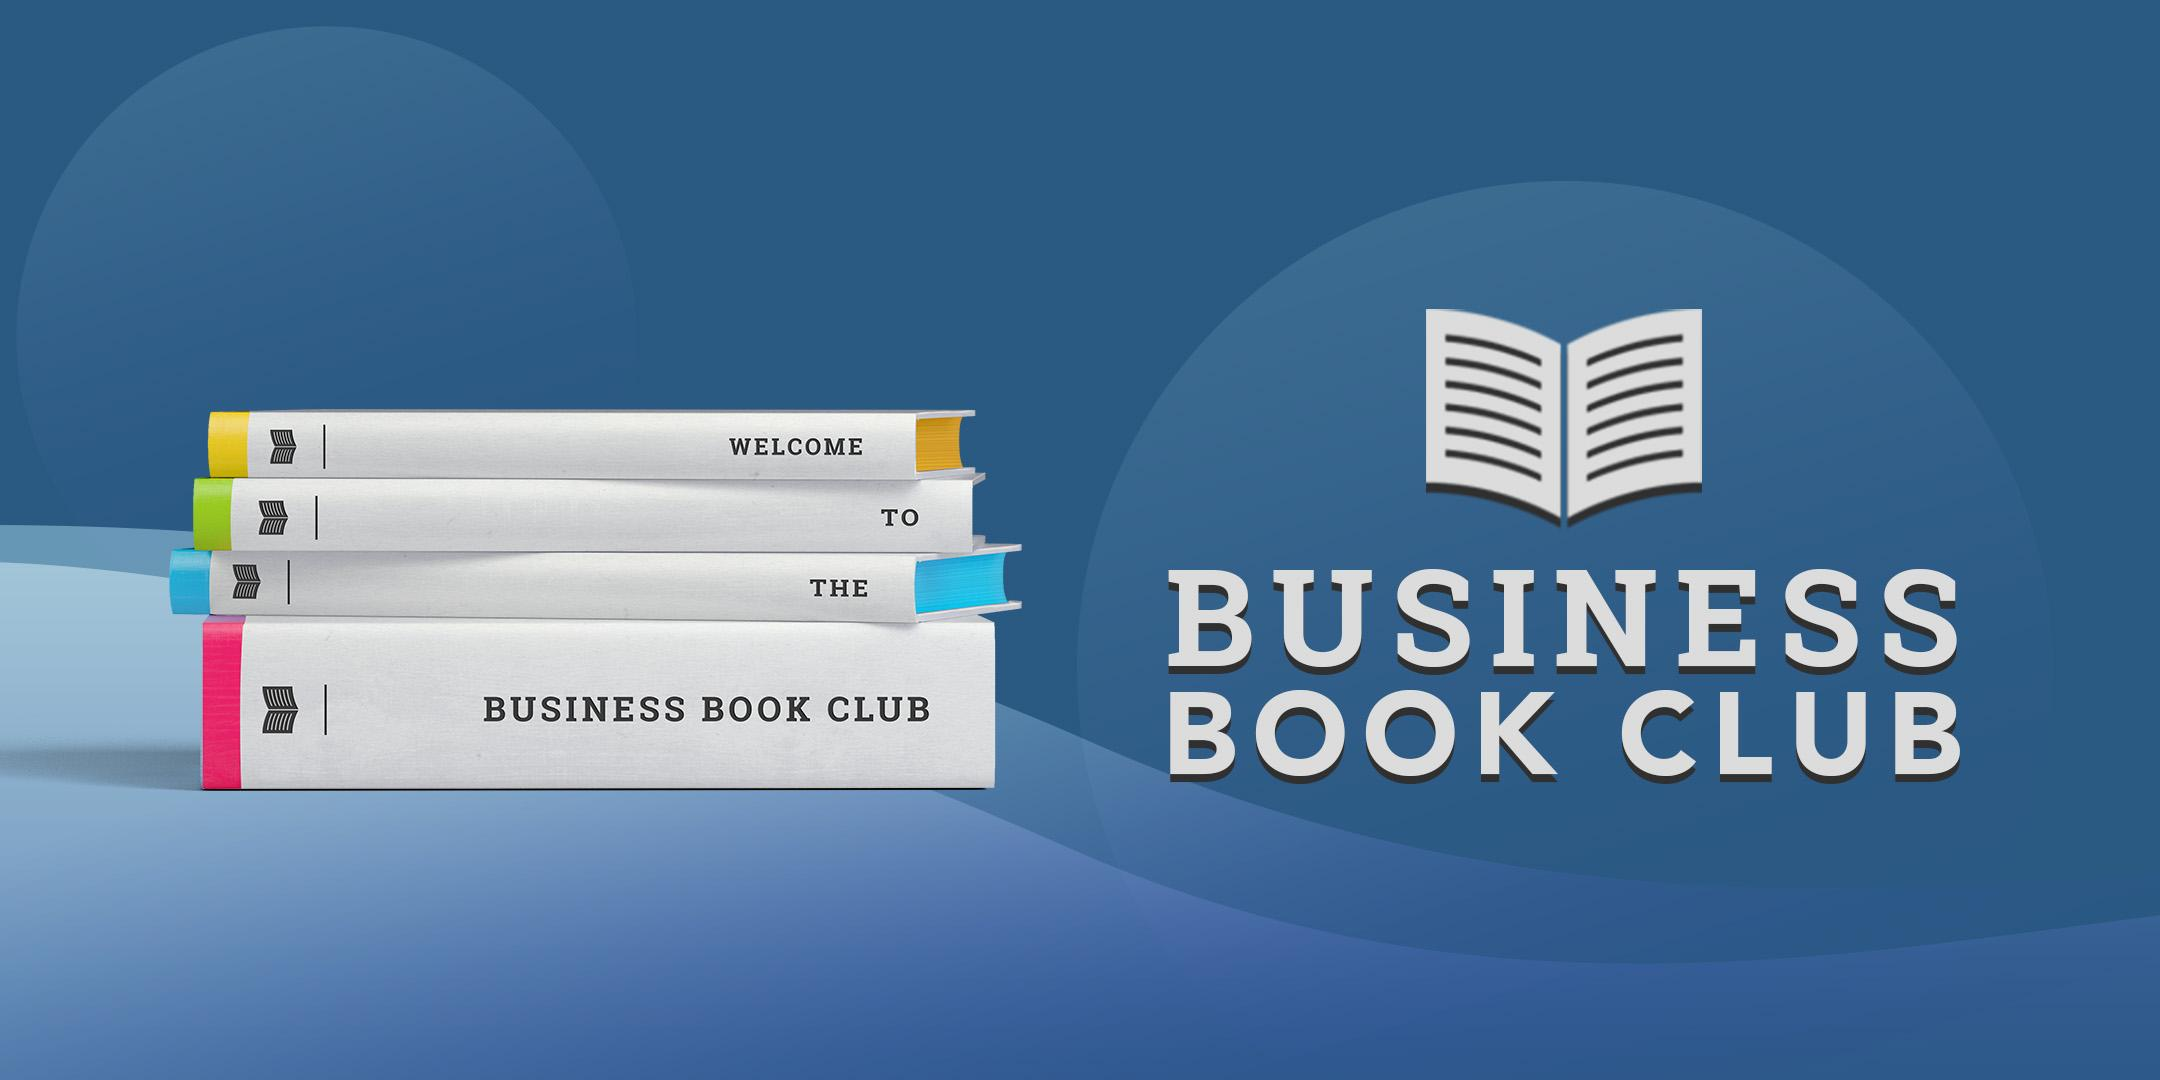 Business Book Club